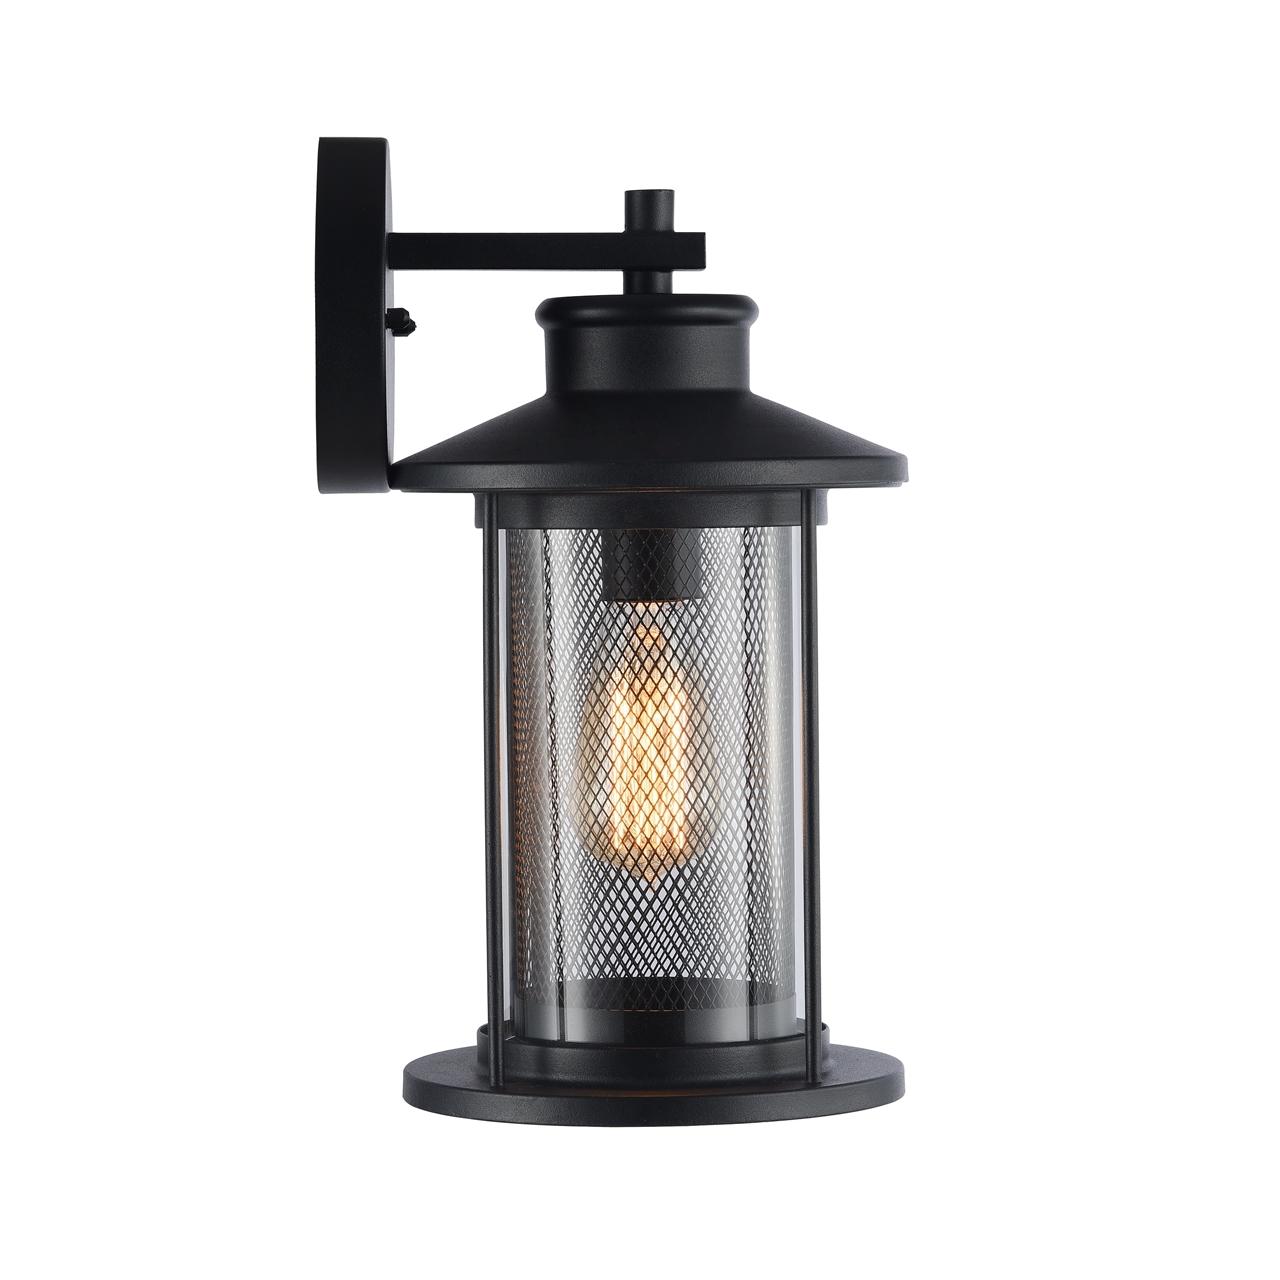 CHLOE Lighting, Inc CHLOE Lighting CRICHTON Transitional ... on Modern Outdoor Wall Sconce id=73895